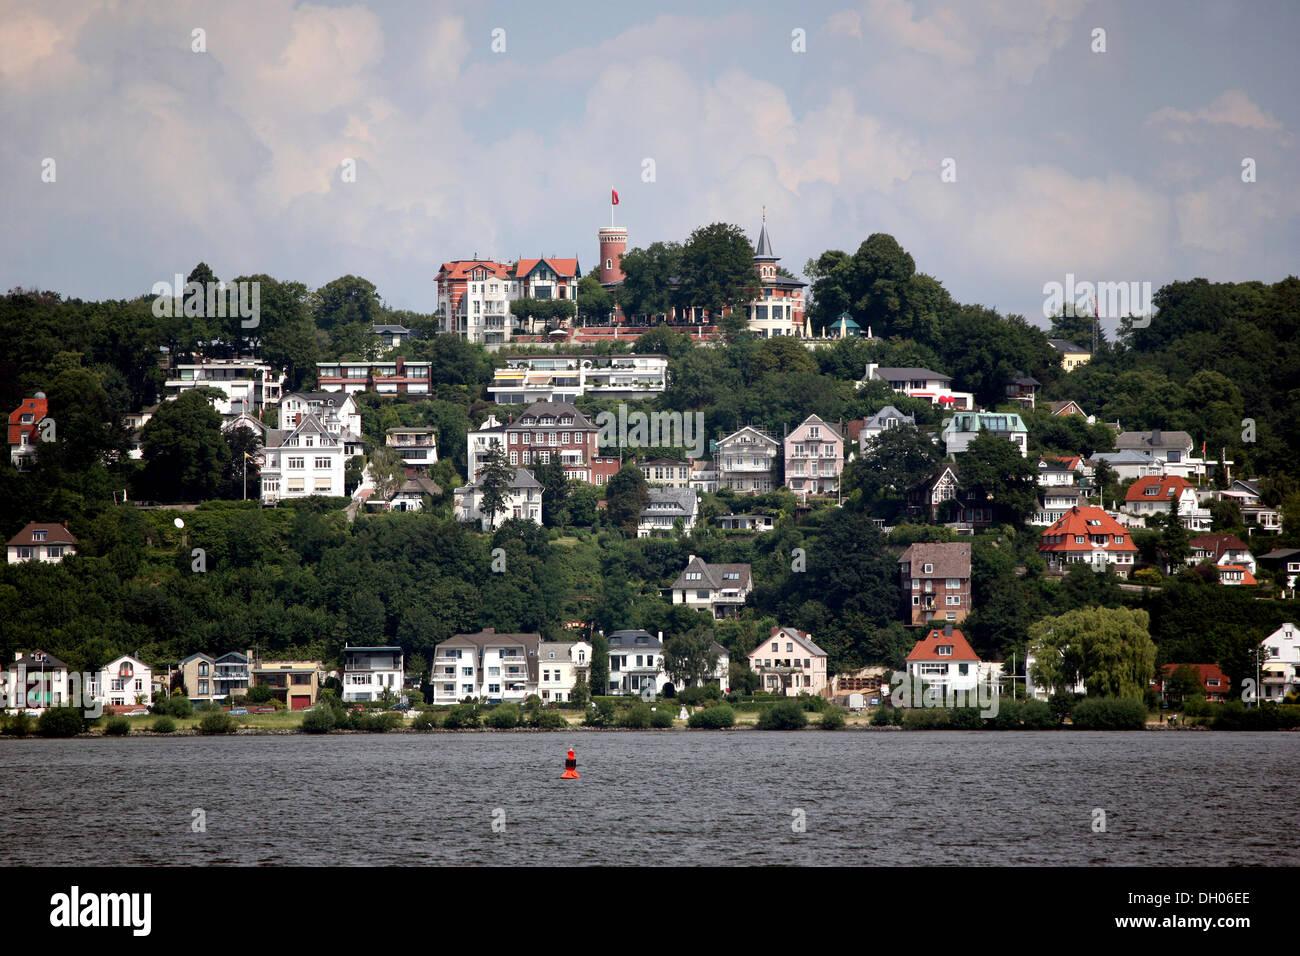 Elbe riverside suburb, Blankenese, Suellberg hill, Hamburg - Stock Image